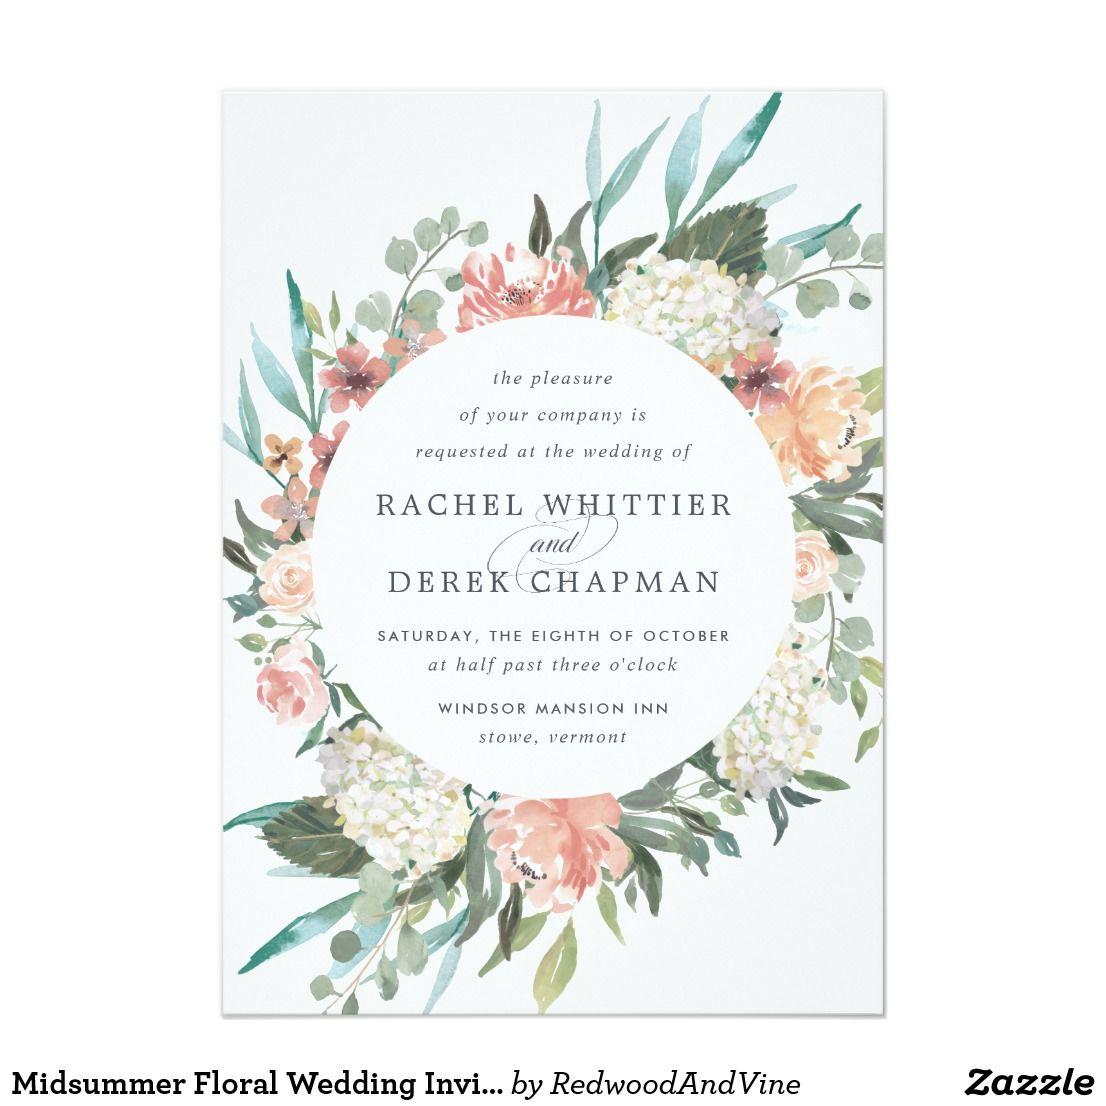 Midsummer Floral Wedding Invitation Zazzle Co Uk Floral Wedding Invitations Watercolor Wedding Invitations Watercolor Floral Wedding Invitations